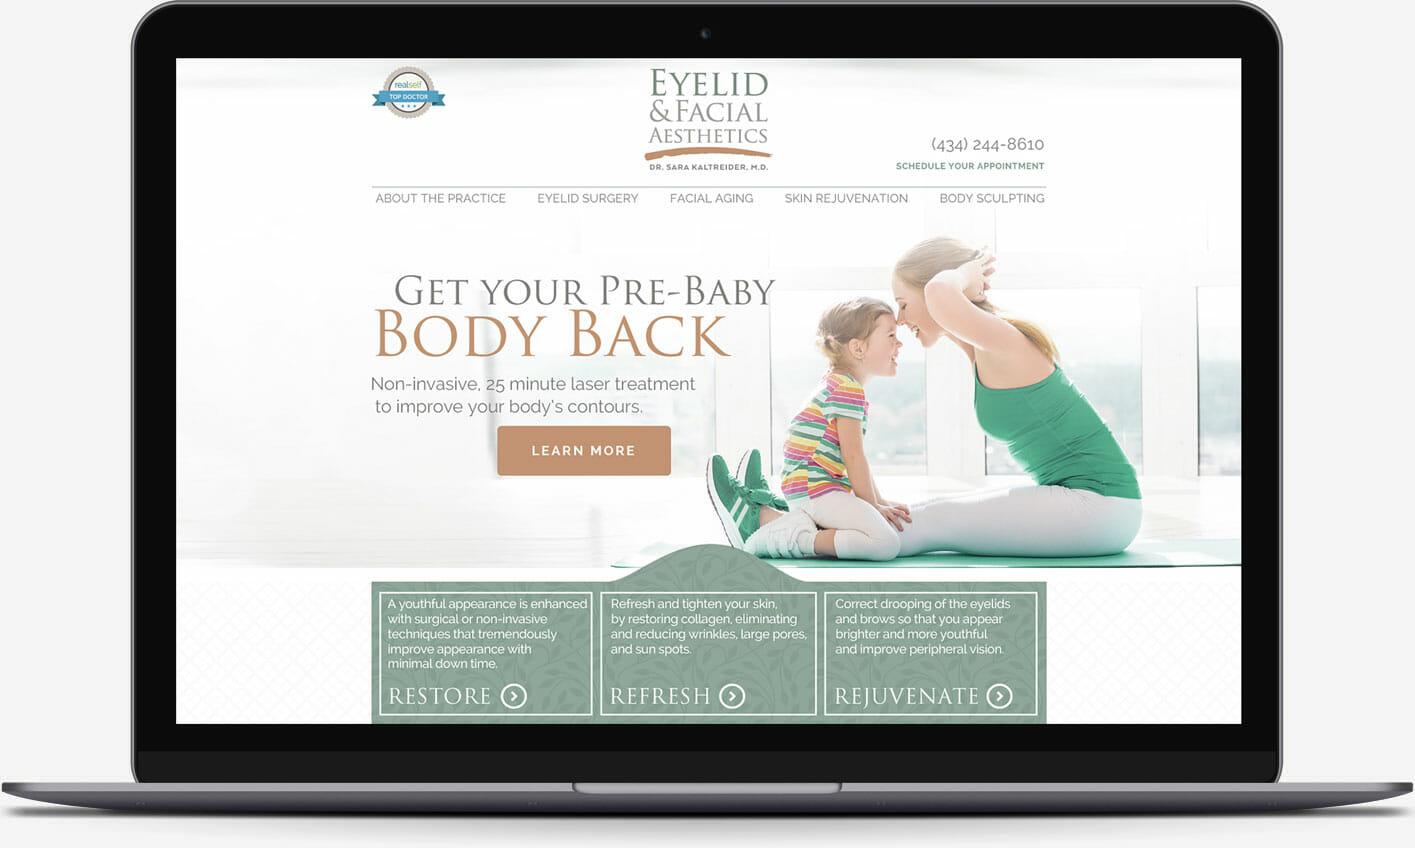 Eyelid & Facial Aesthetics website homepage design